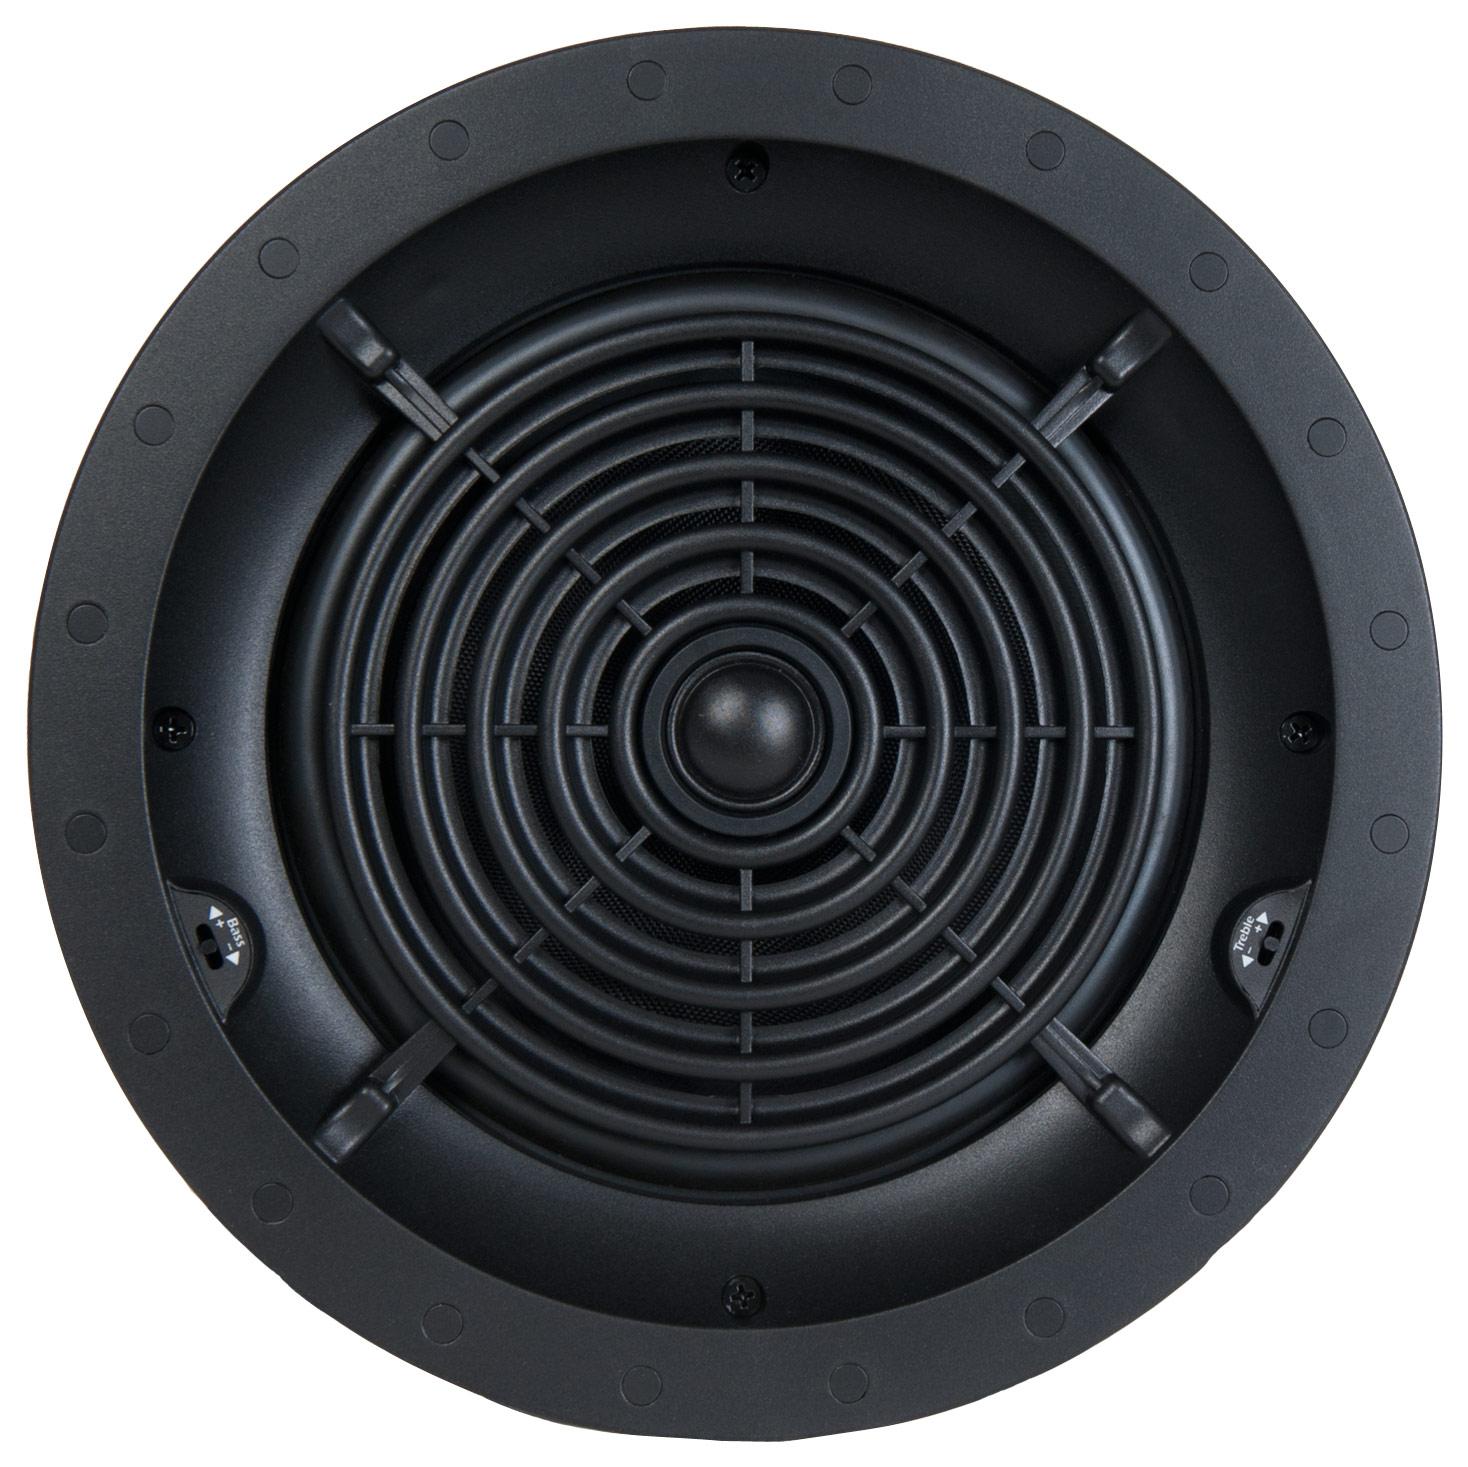 "SpeakerCraft - AIM Series Profile CRS8 Two 8"" In-Ceiling Speaker (Each) - Black"